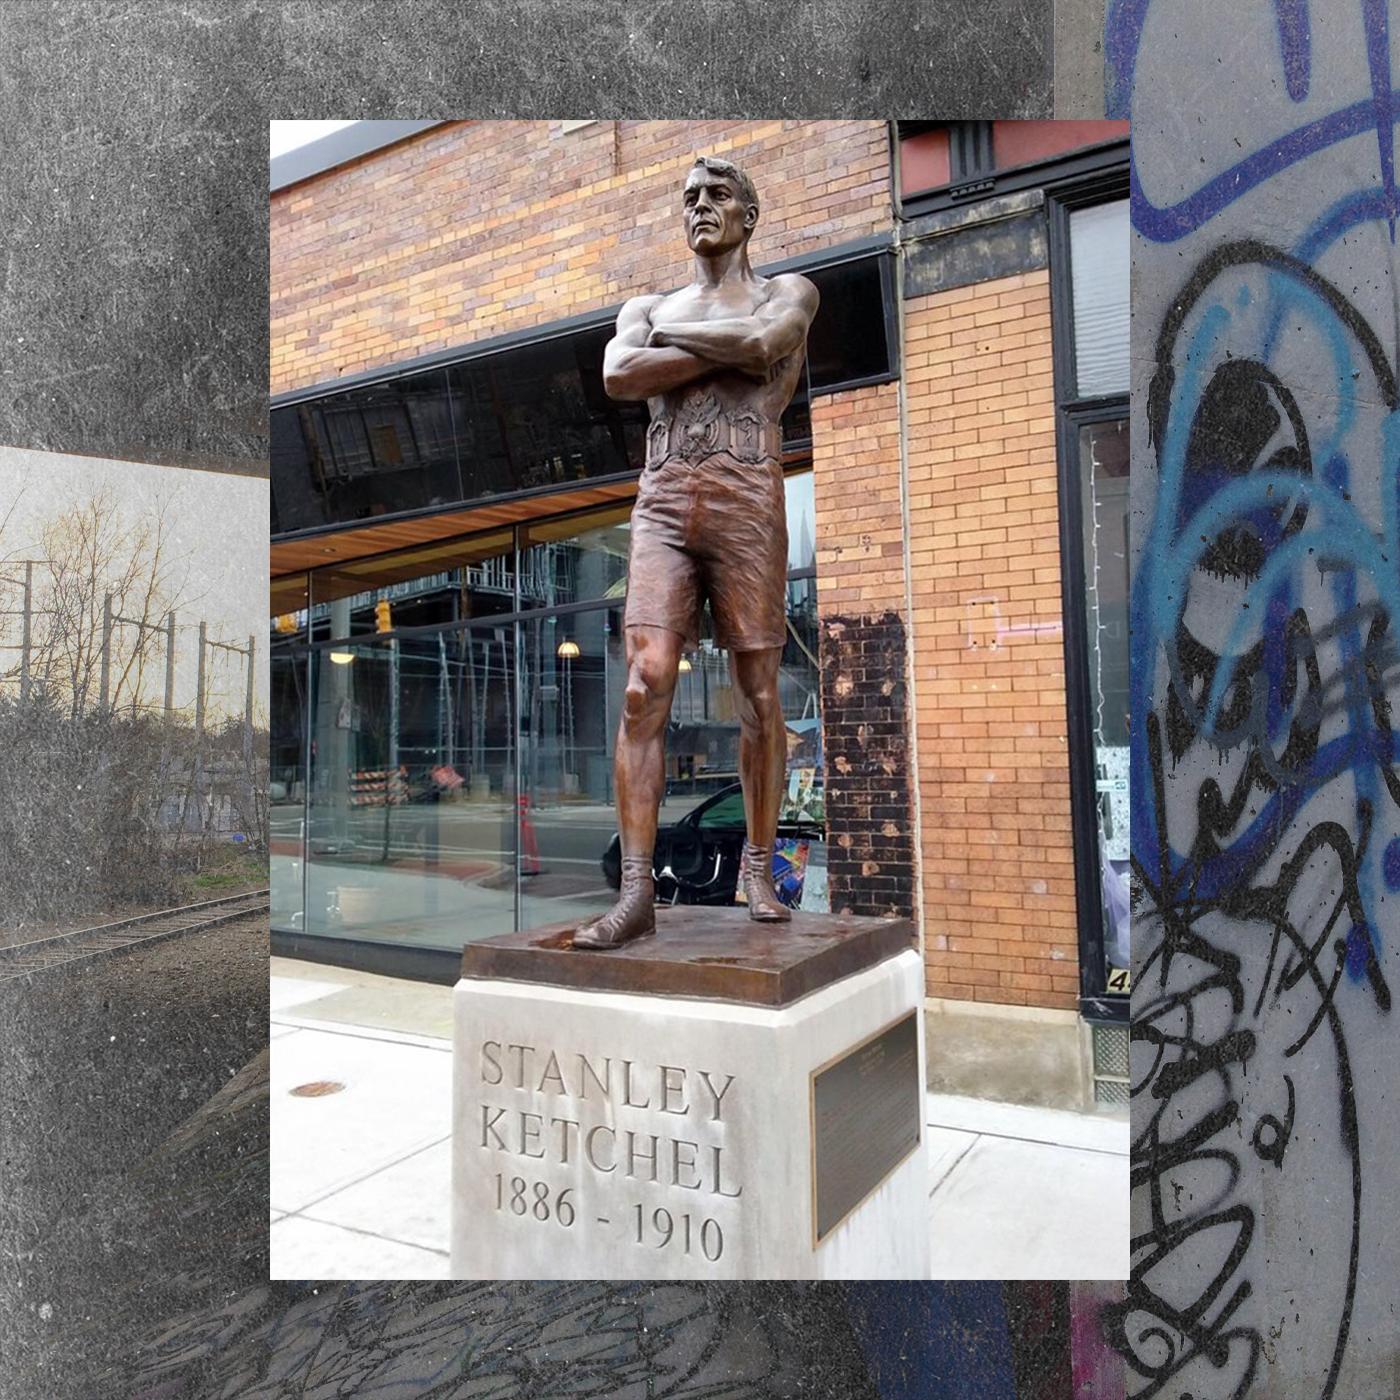 Stanley Ketchel's statue on GR's west side